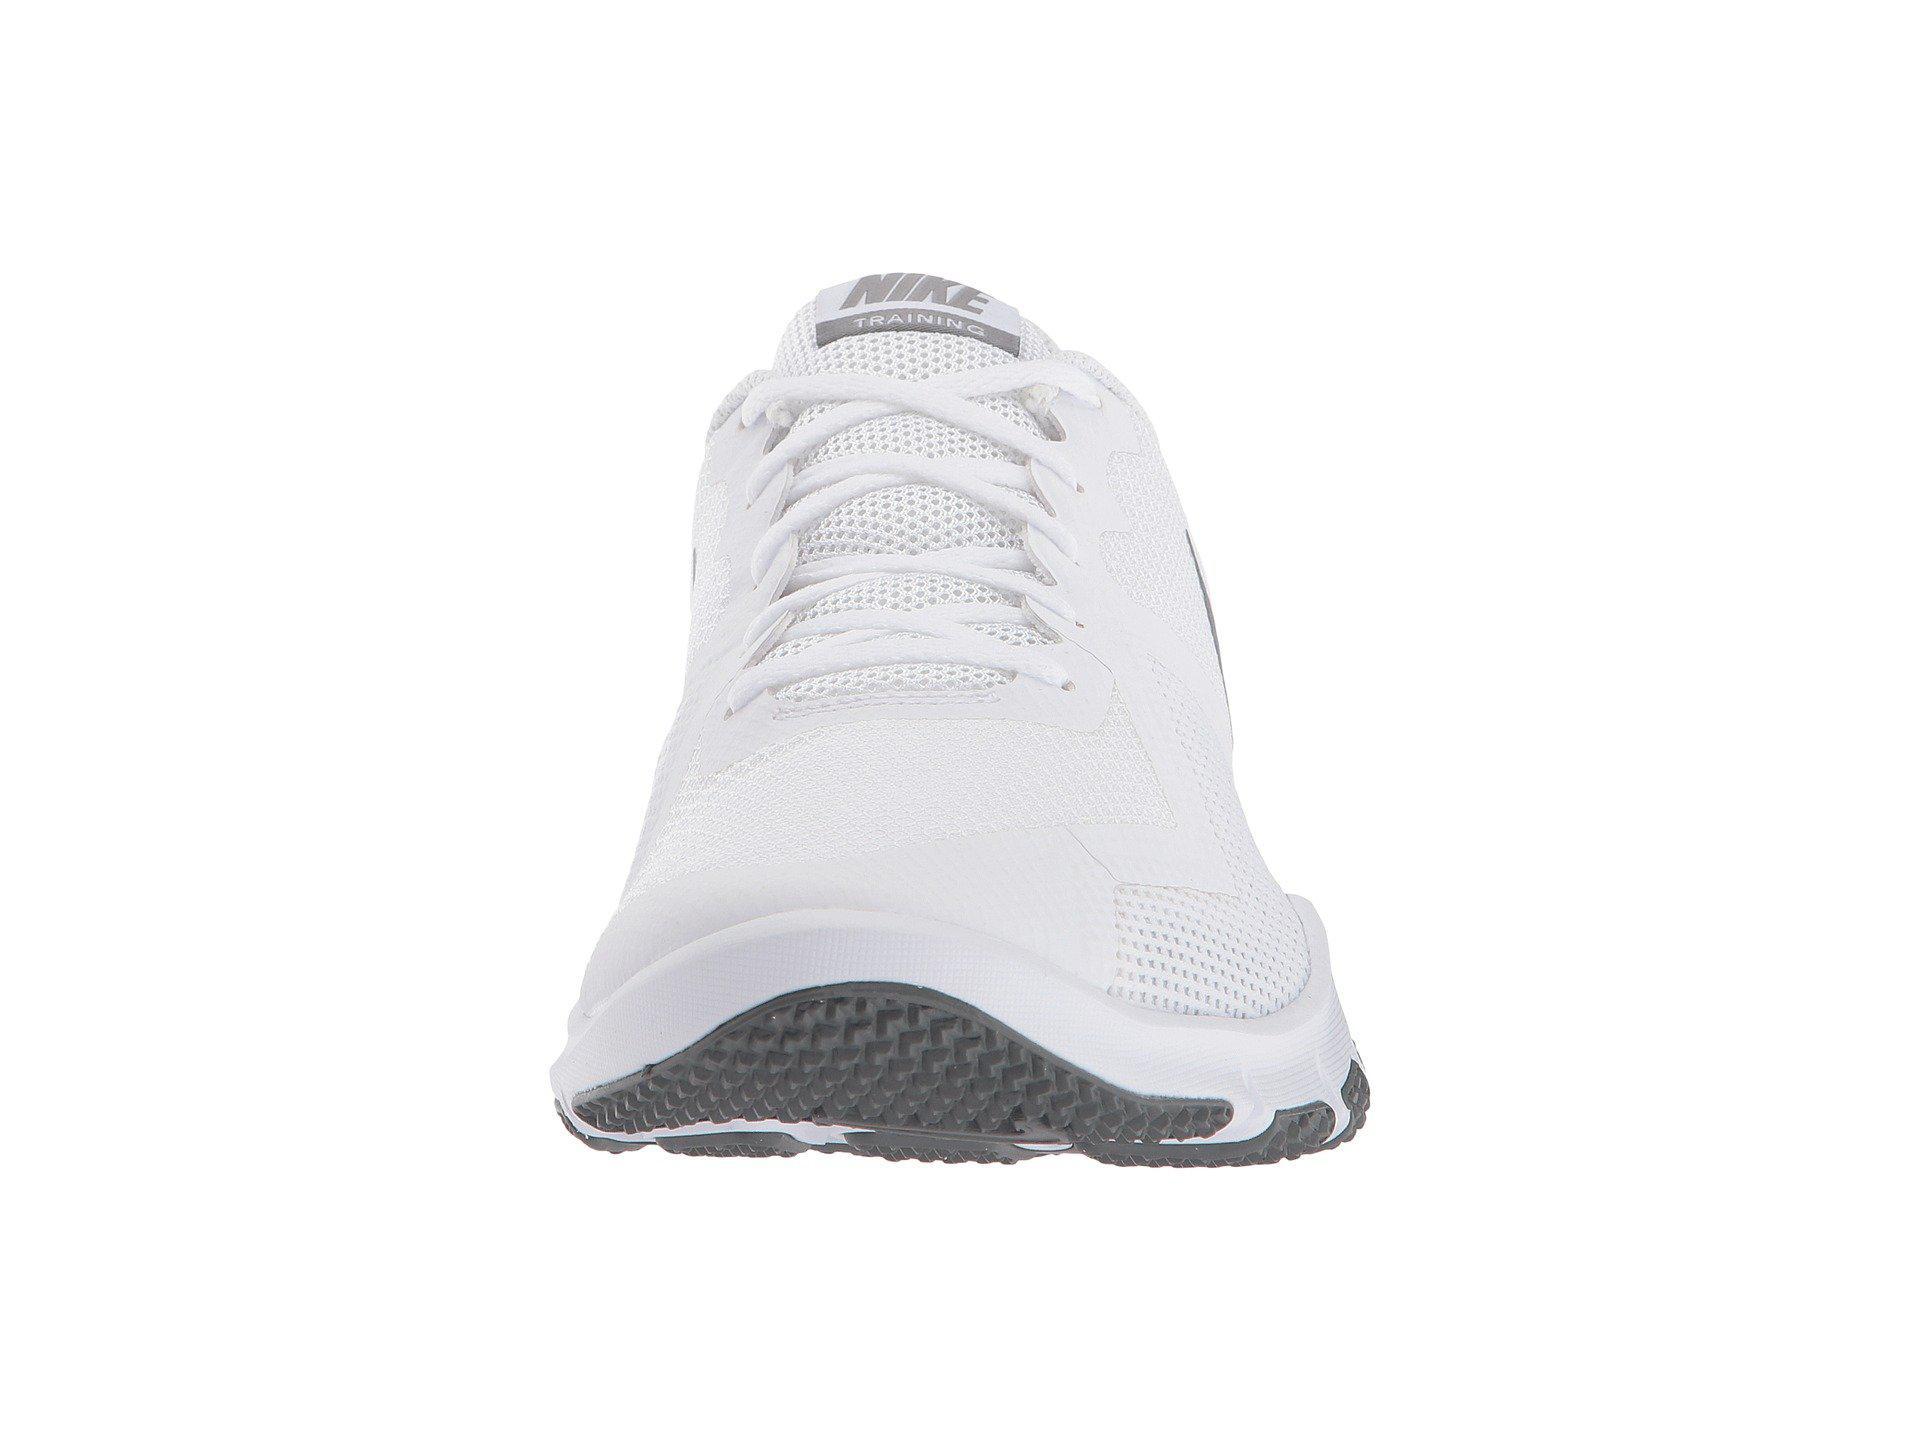 0468c261972a Lyst - Nike Flex Control Ii (black gym Red white) Men s Cross ...